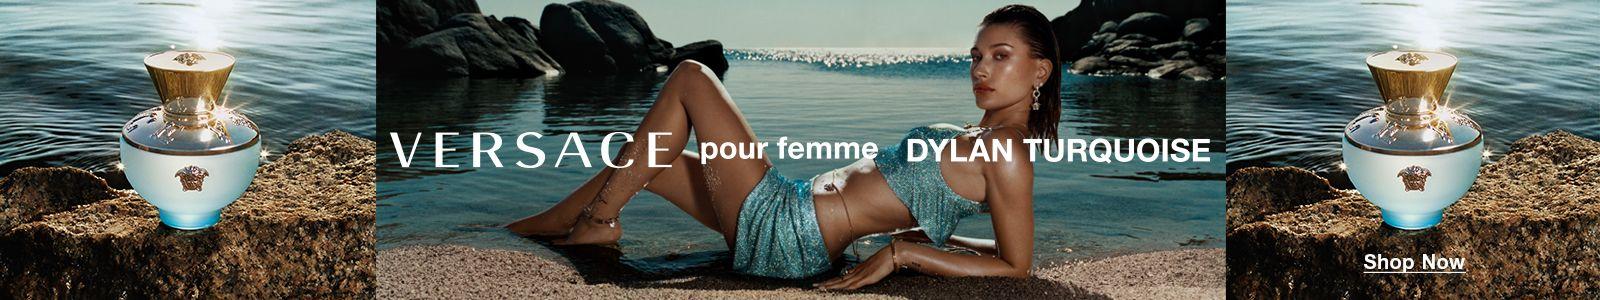 Versace pour femme Dylan Turquoise, Shop Now